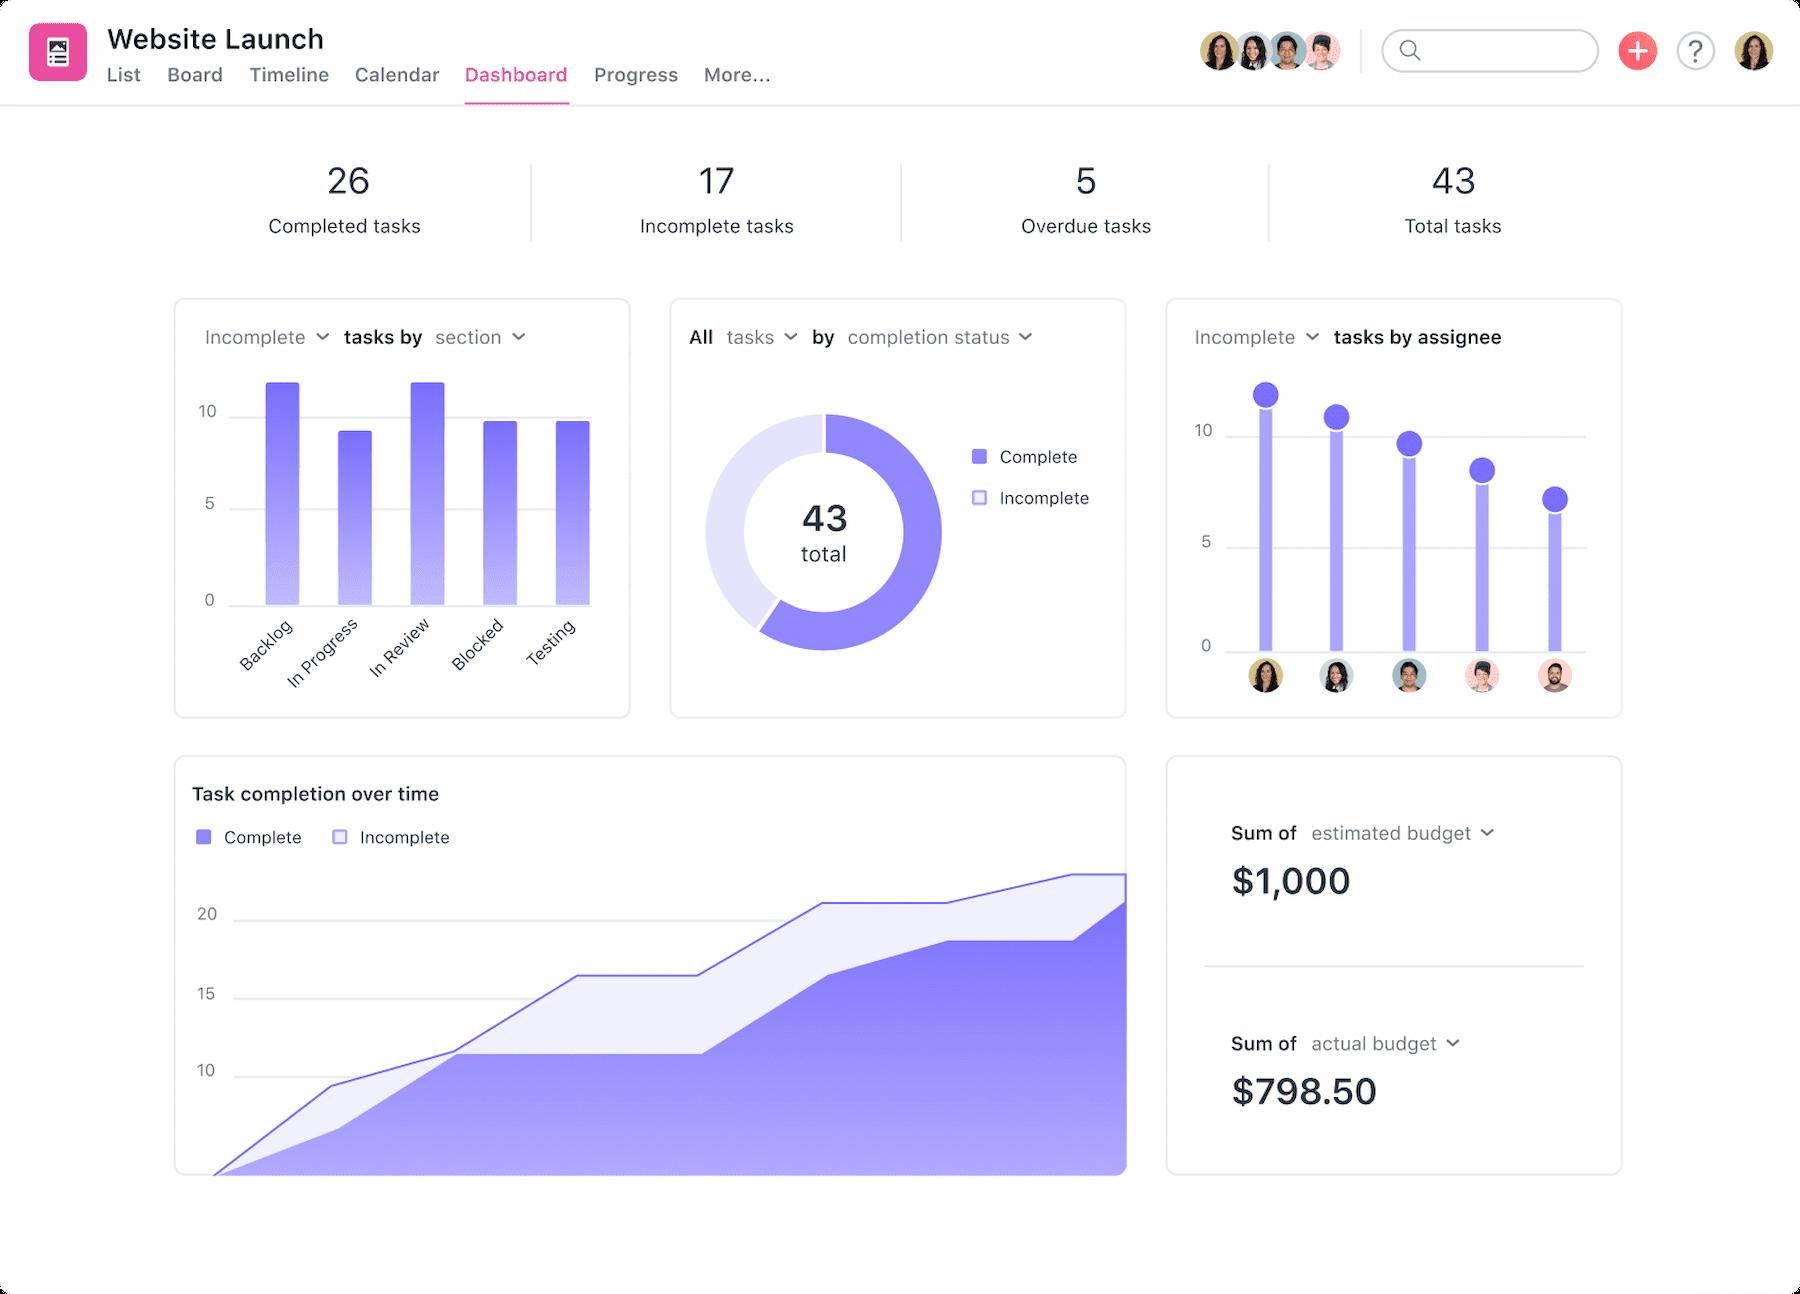 Website launch project dashboard in Asana